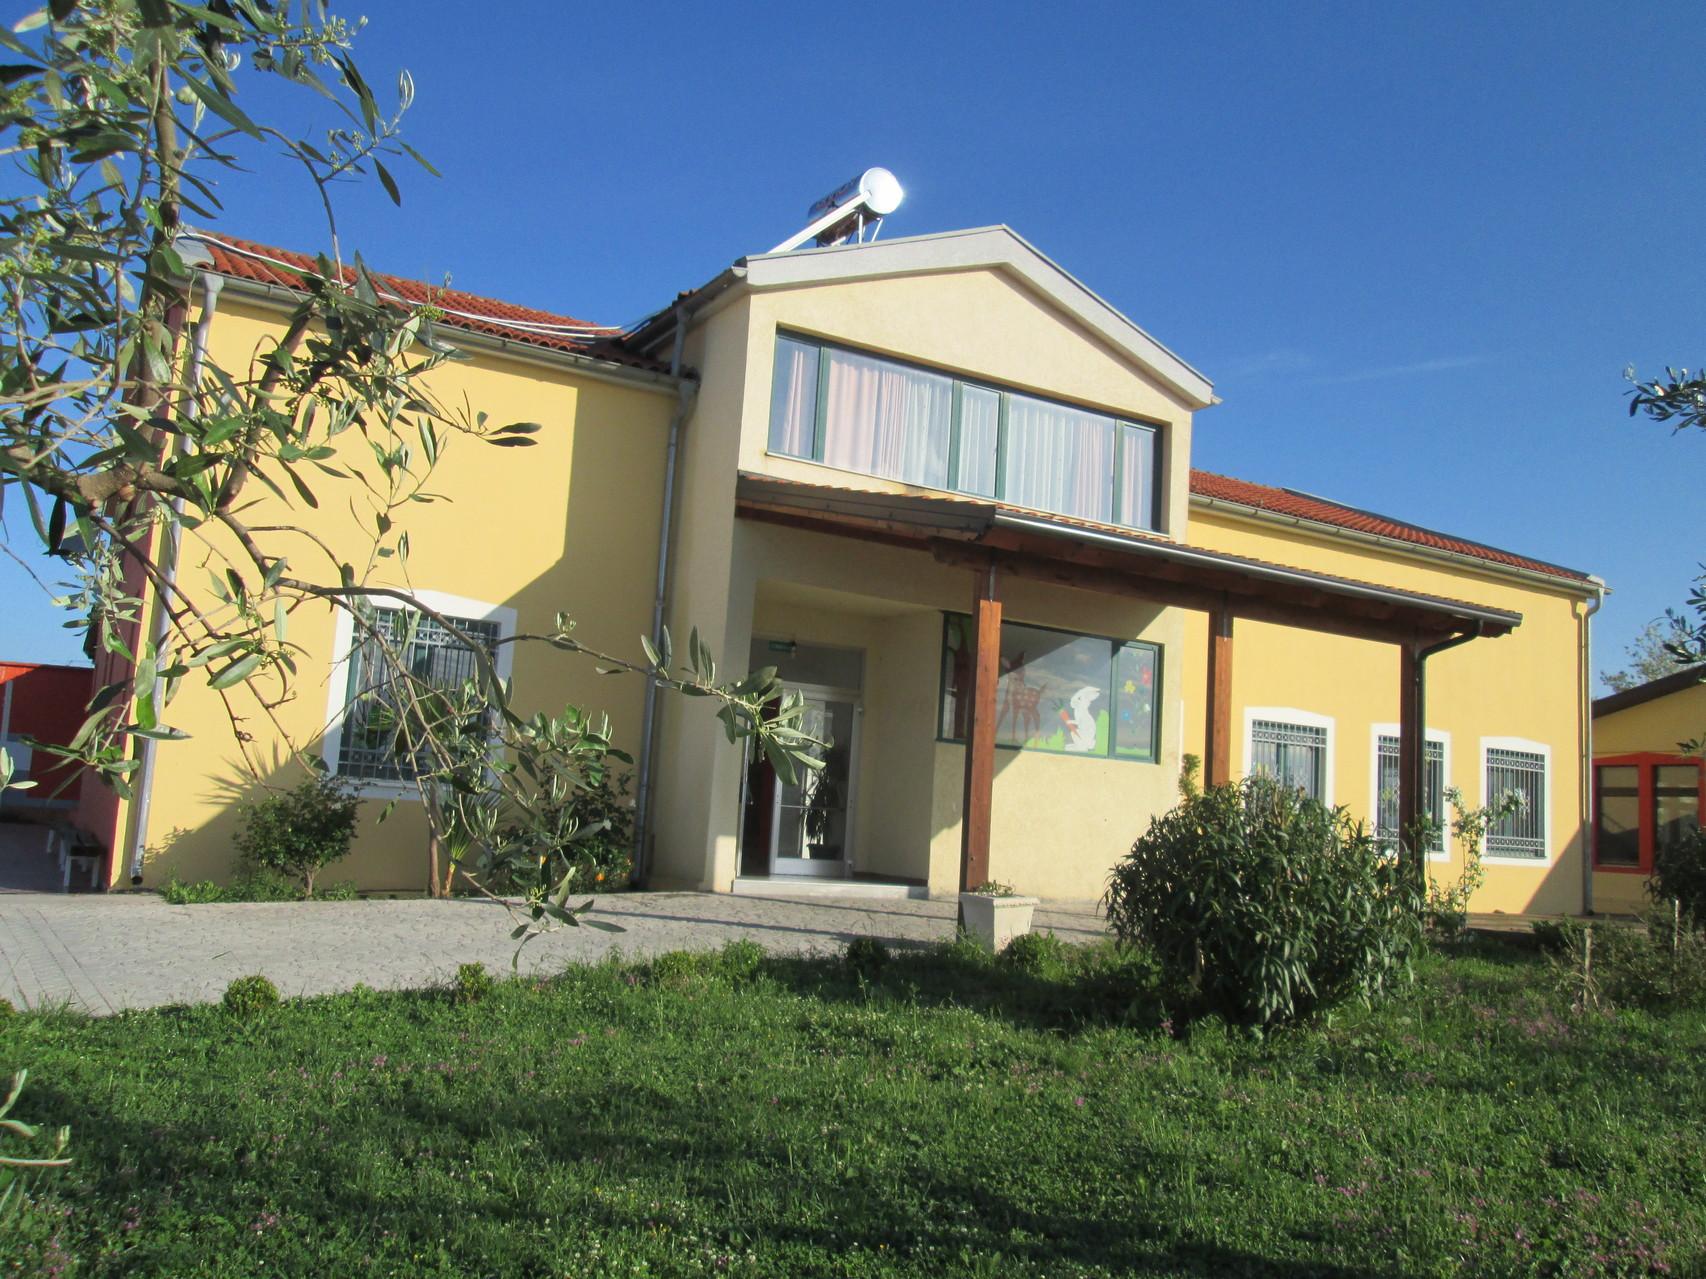 Scuola Materna a Velipoja (Albania)